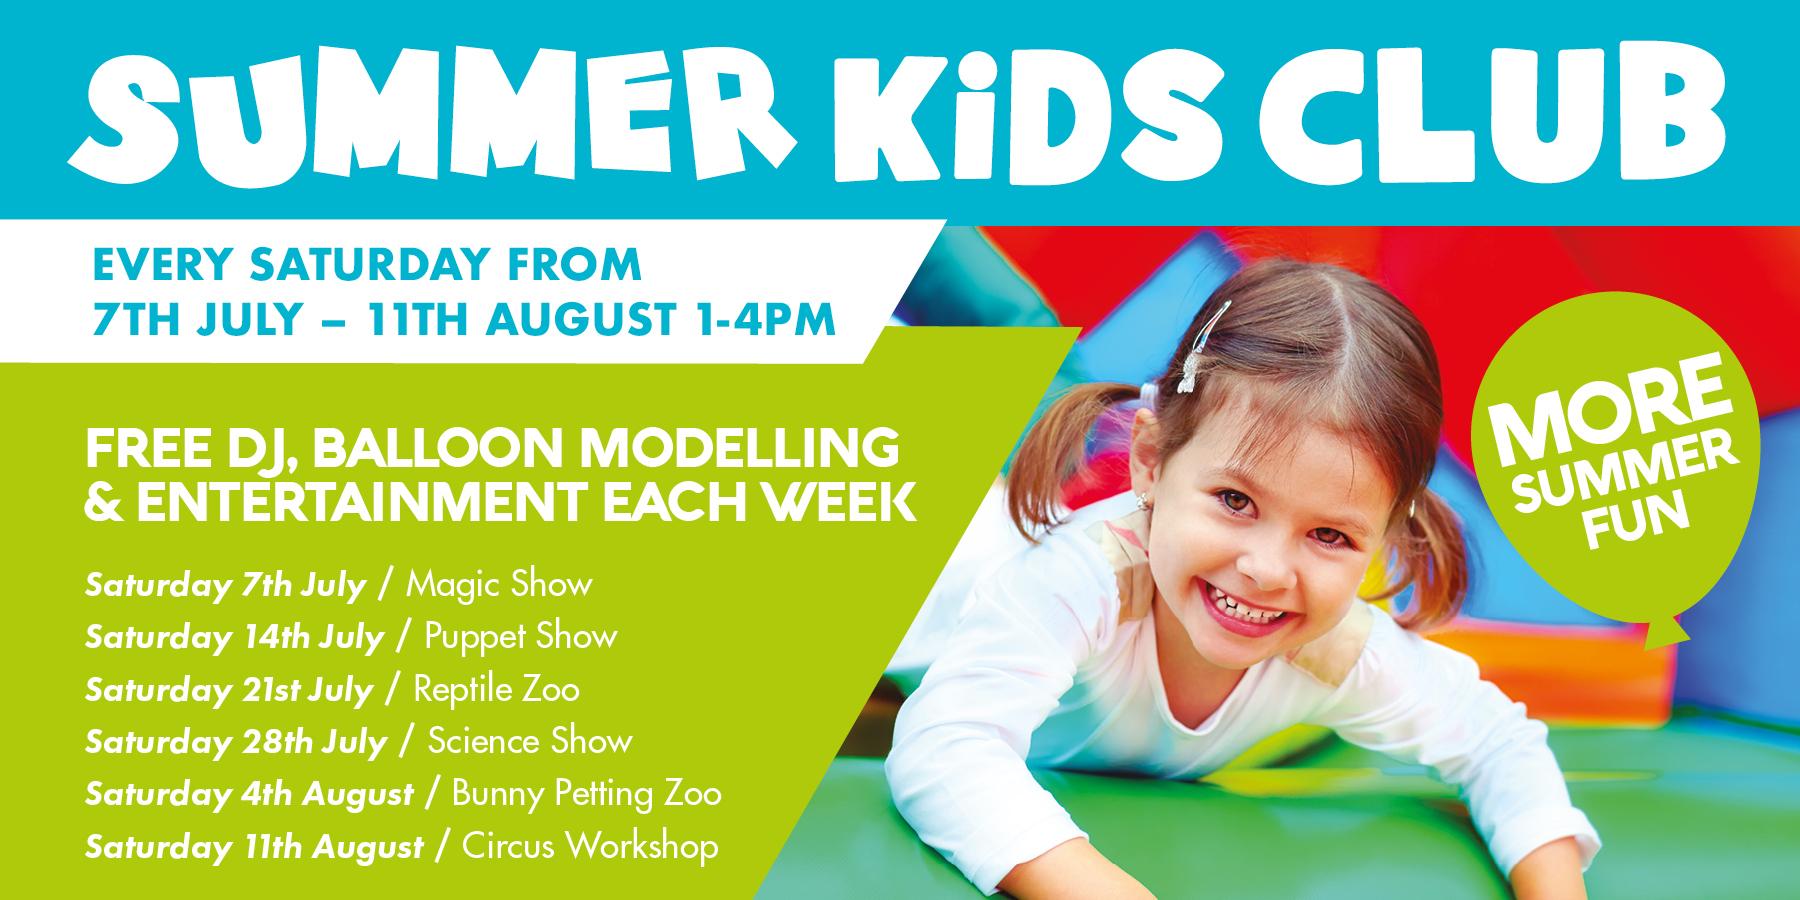 11185 CWEST Summer Kids Club Web Banner 1800x900 02.07.18